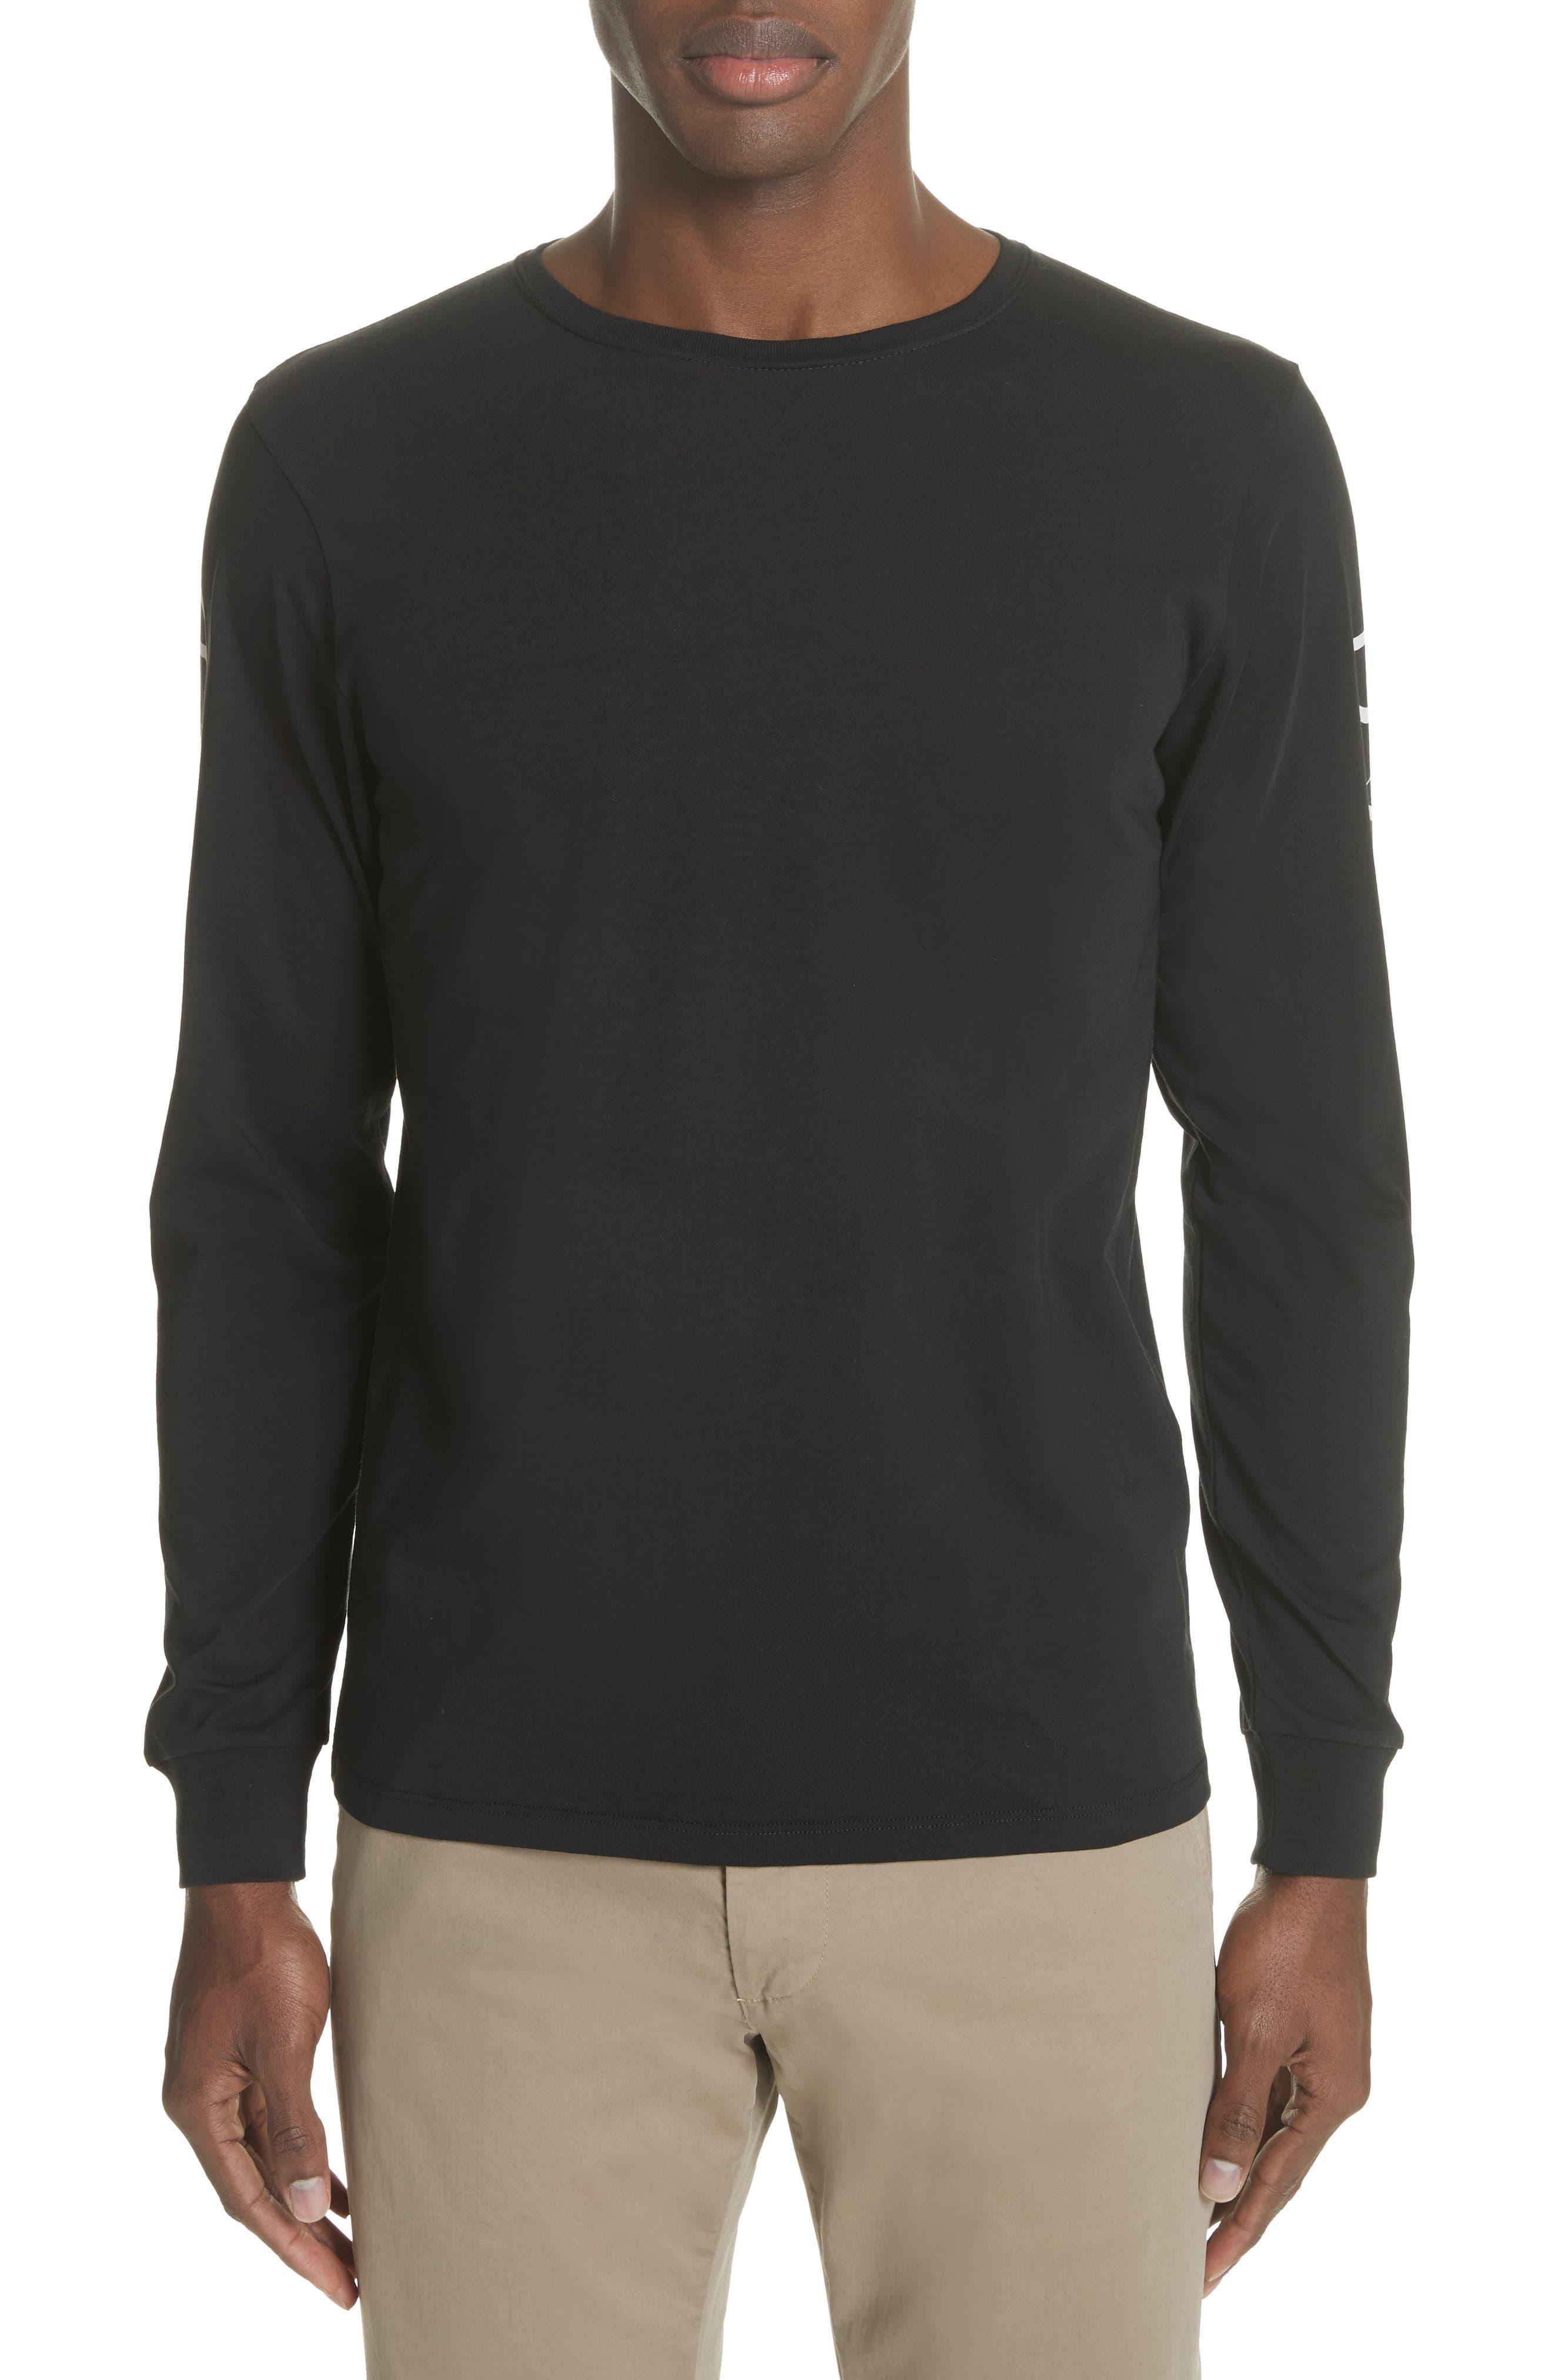 Alternate Image 1 Selected - Saturdays NYC Reverse Print Long Sleeve T-Shirt